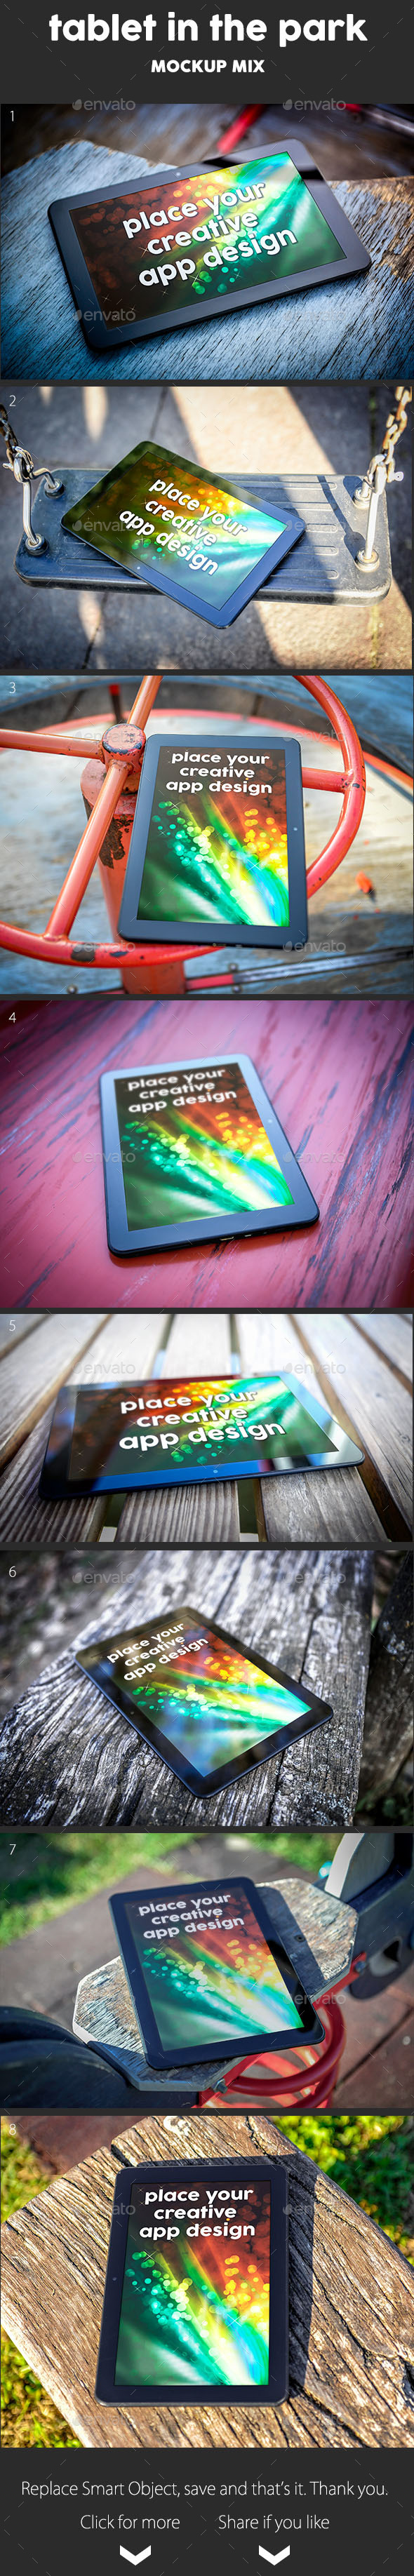 Tablet in The Park mock Up - Mobile Displays